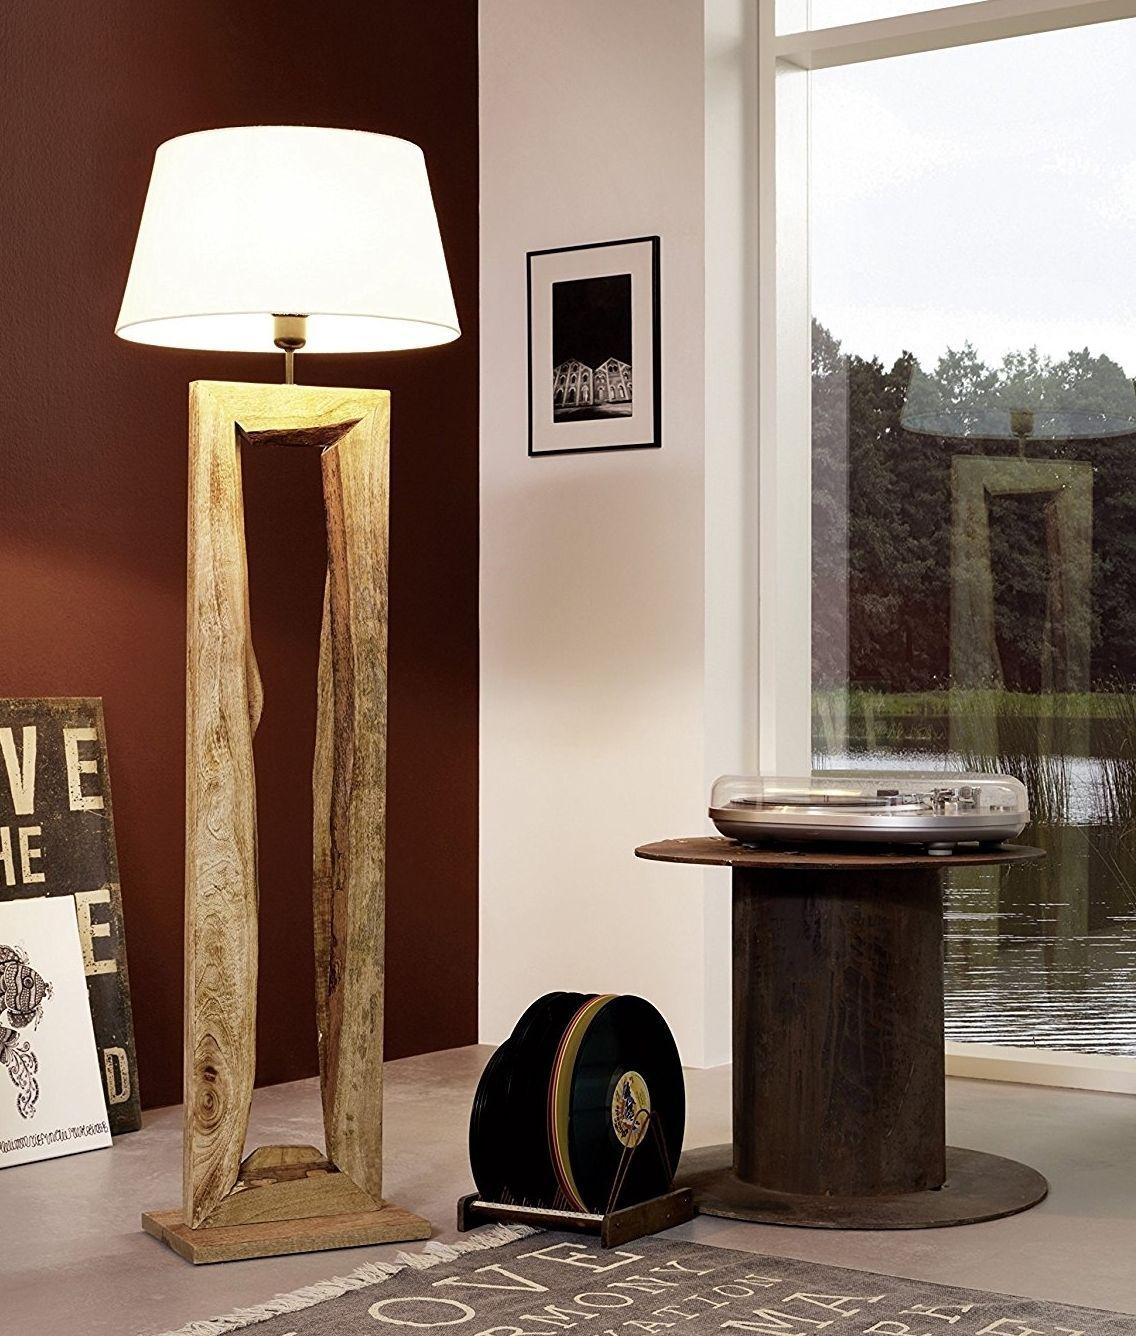 Rustic Driftwood Wooden Floor Lamp With Shade Abajur De Madeira